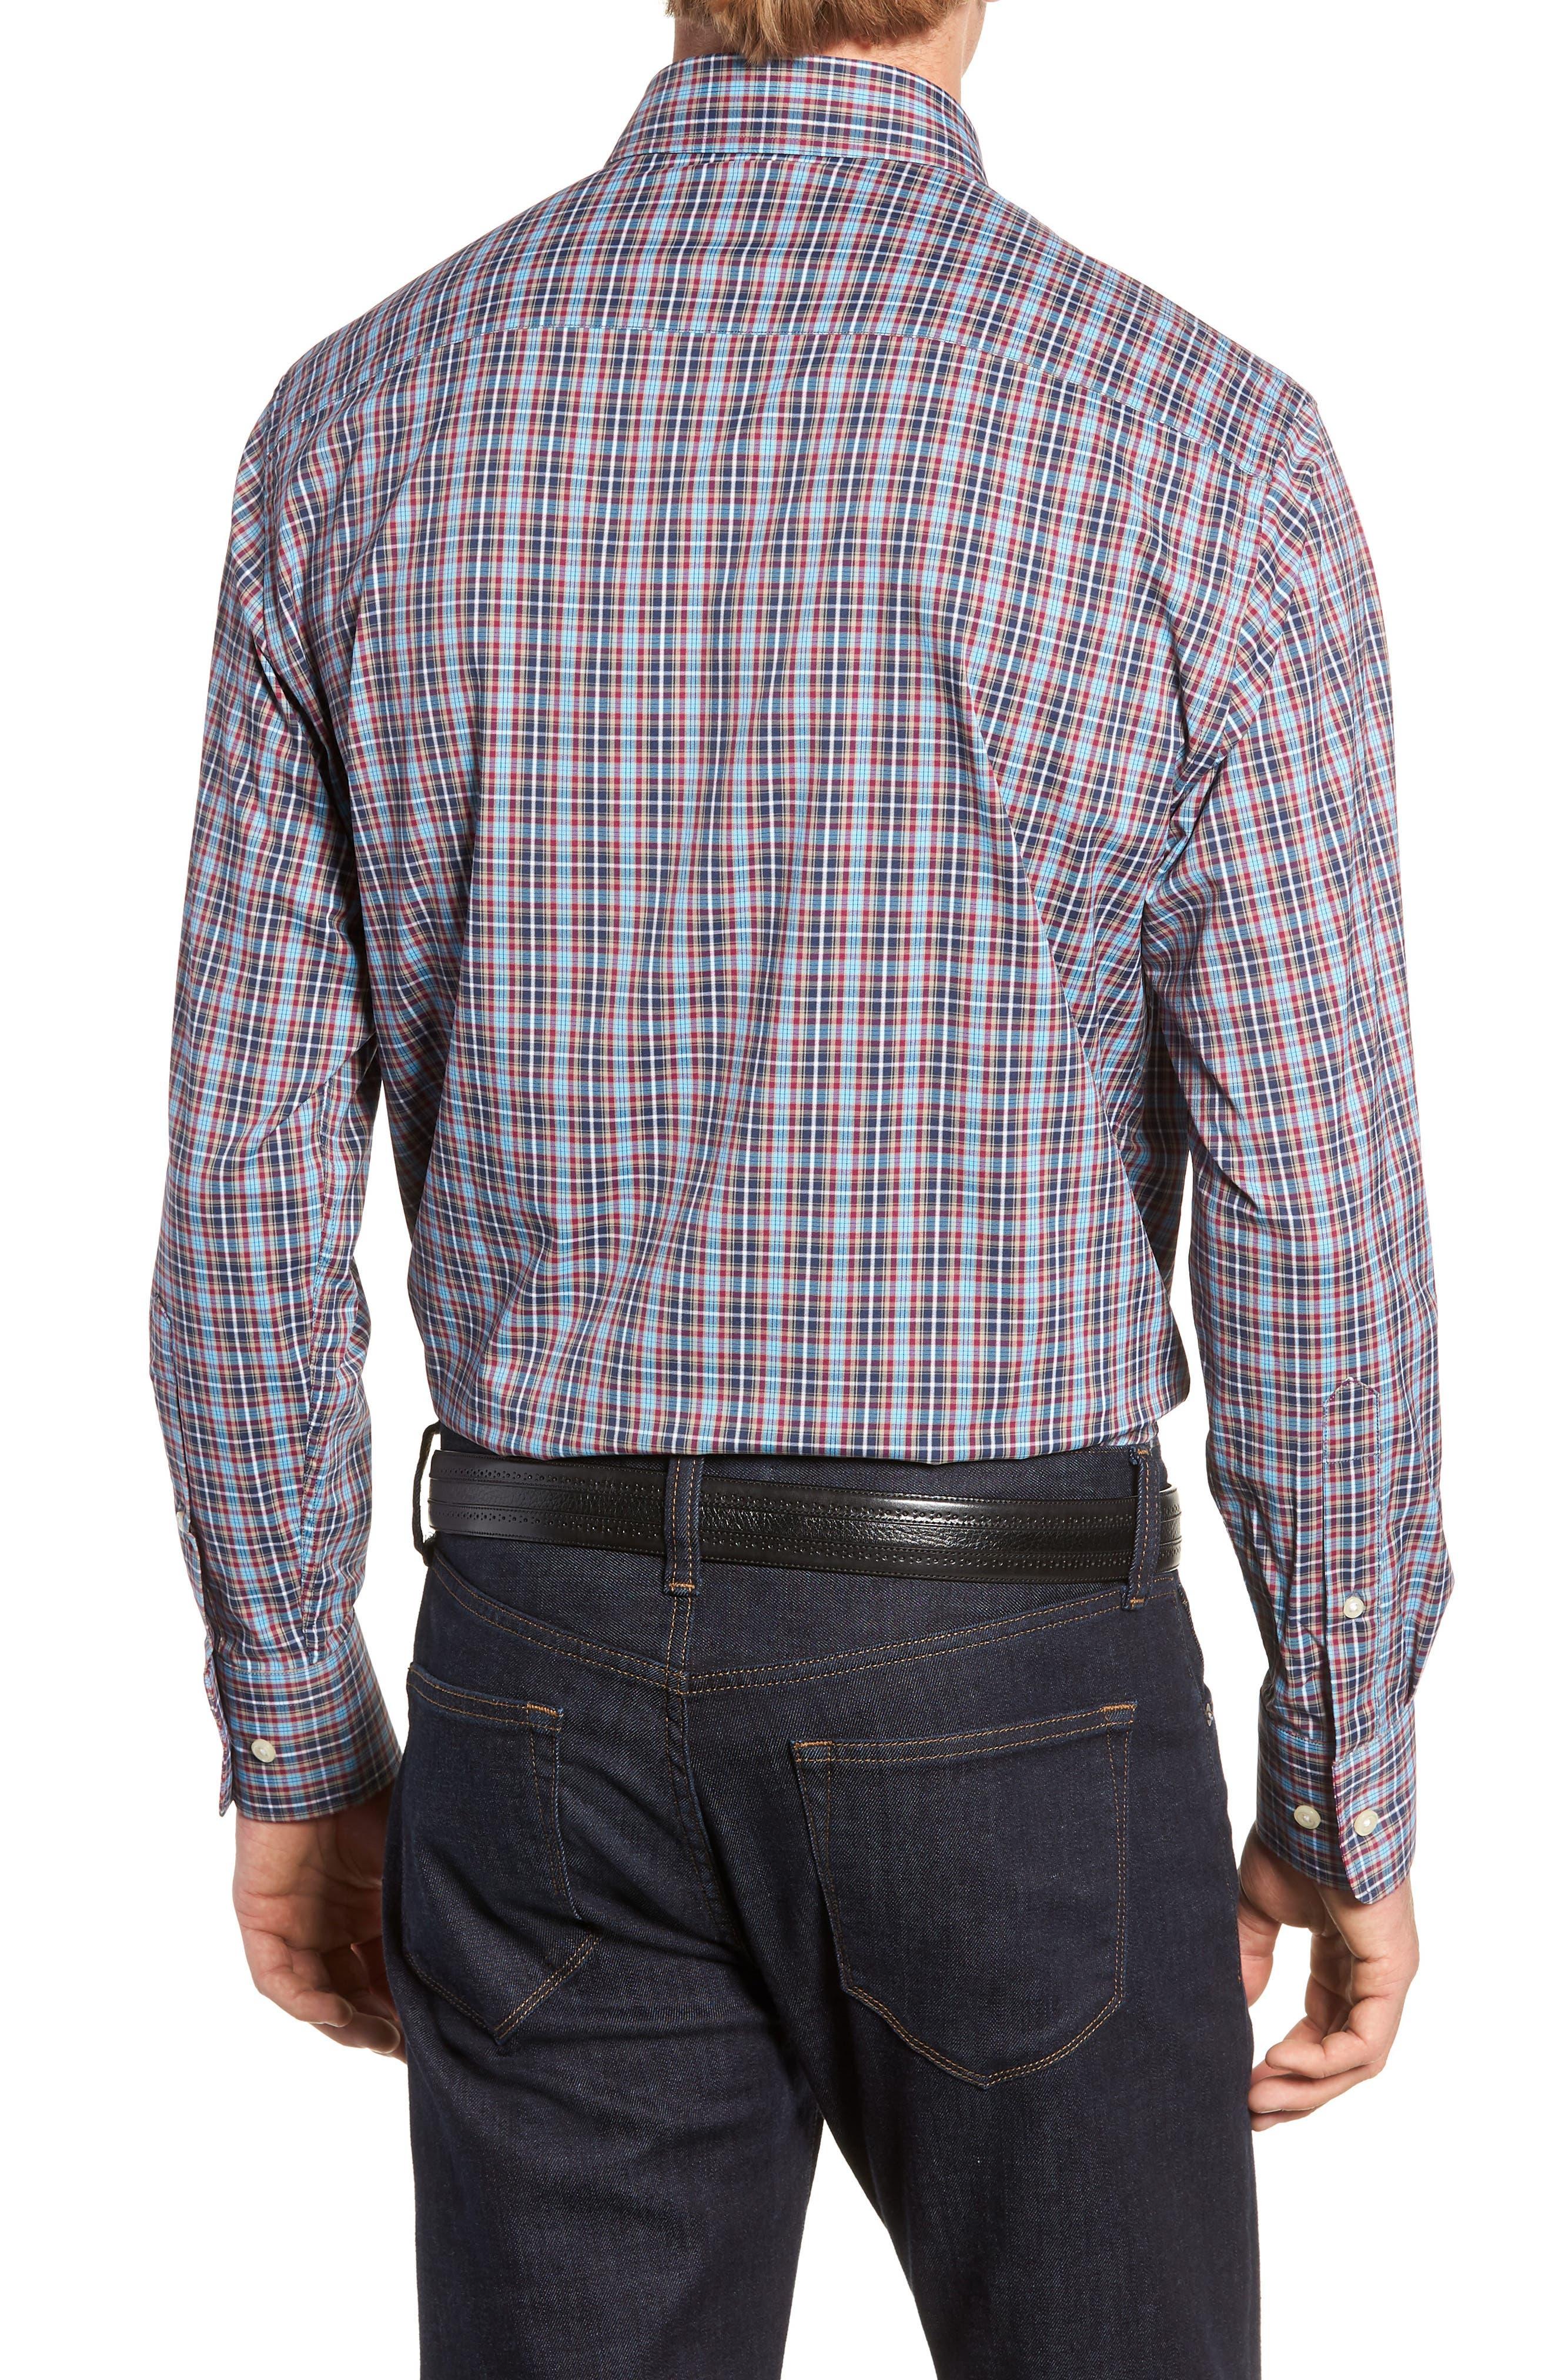 Clyde Plaid Performance Sport Shirt,                             Alternate thumbnail 3, color,                             NAVY